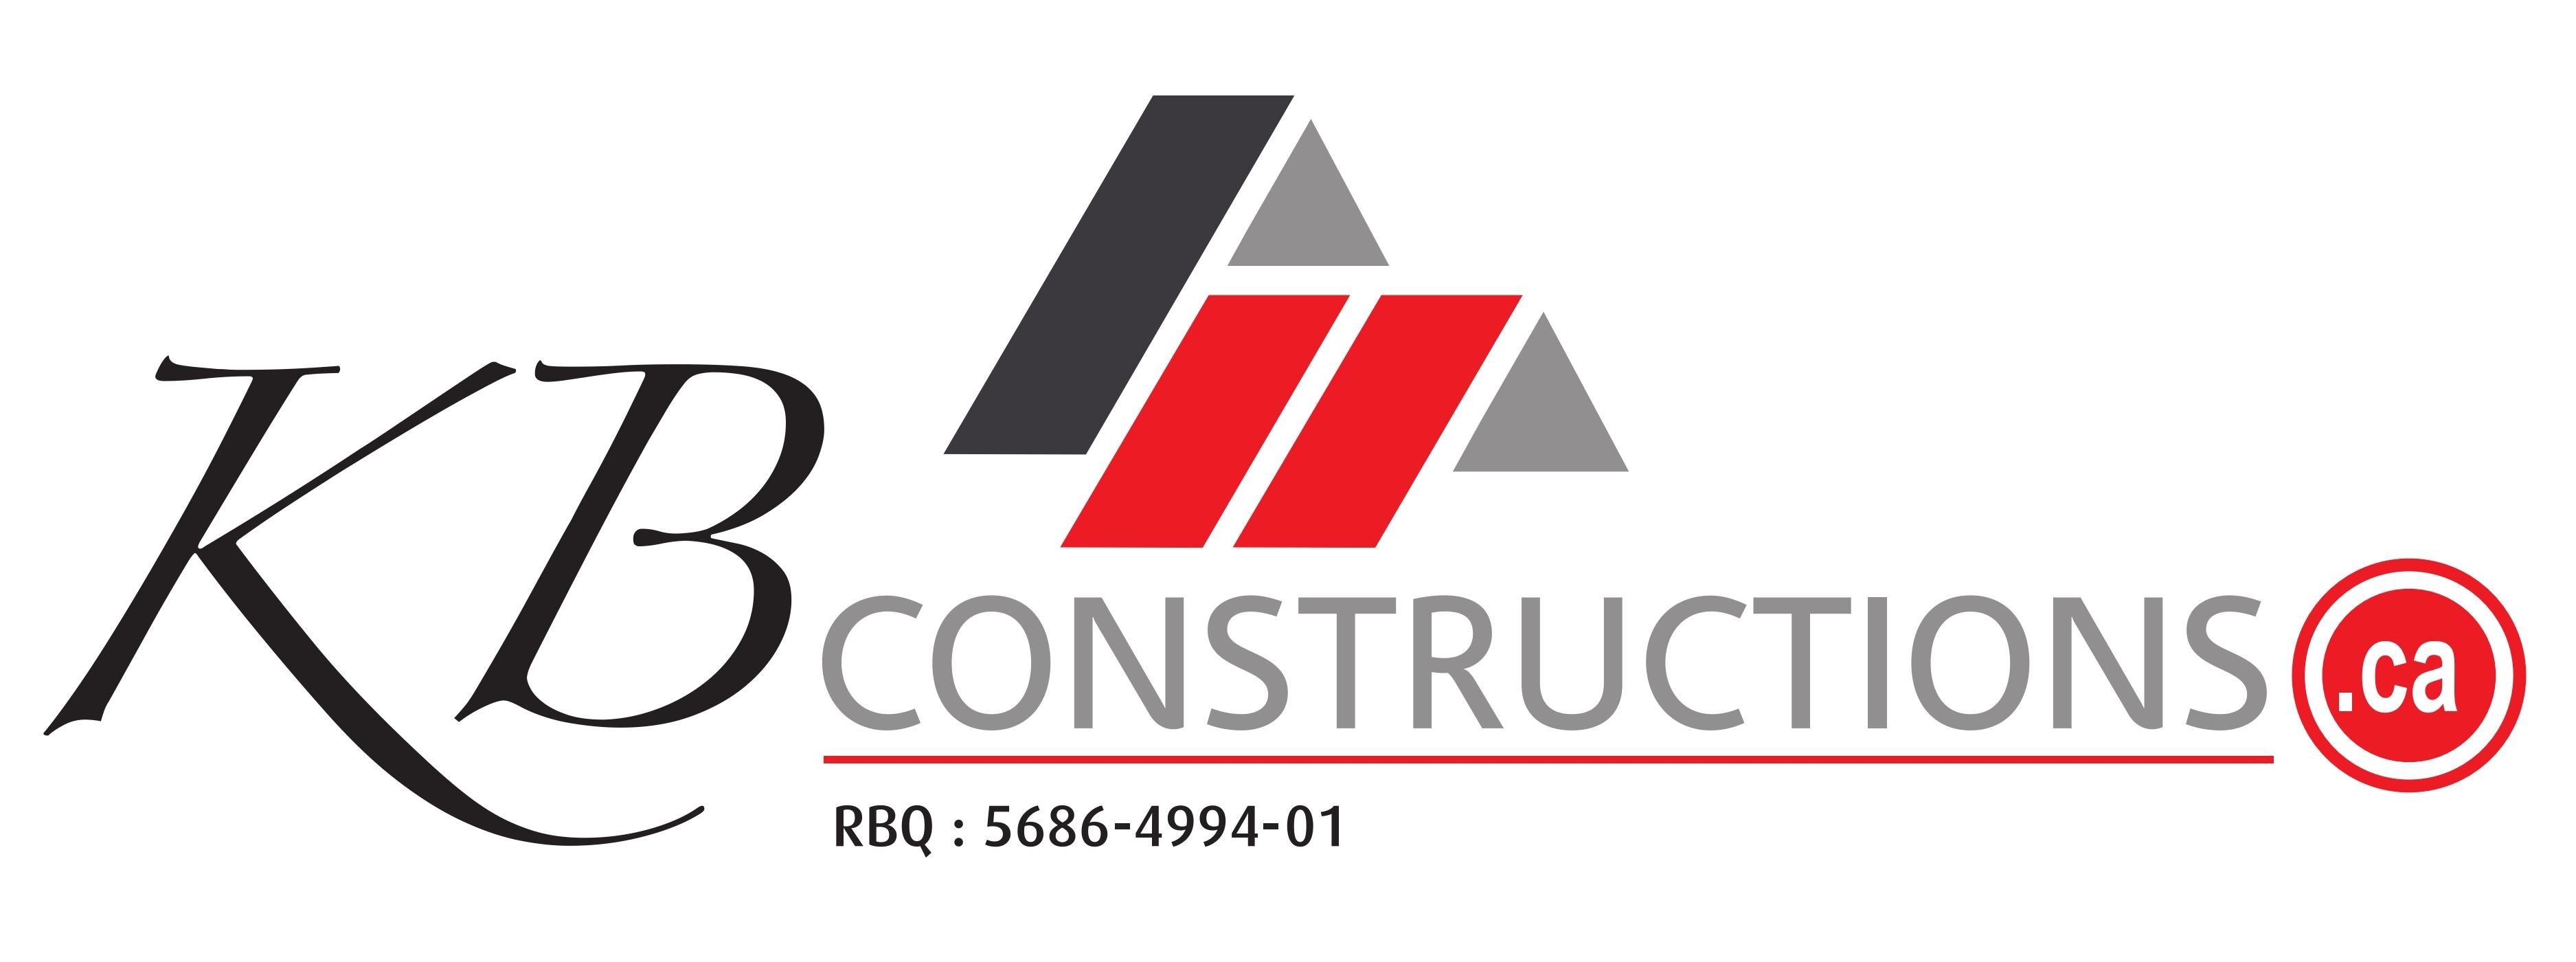 Kb Construction Logo 001